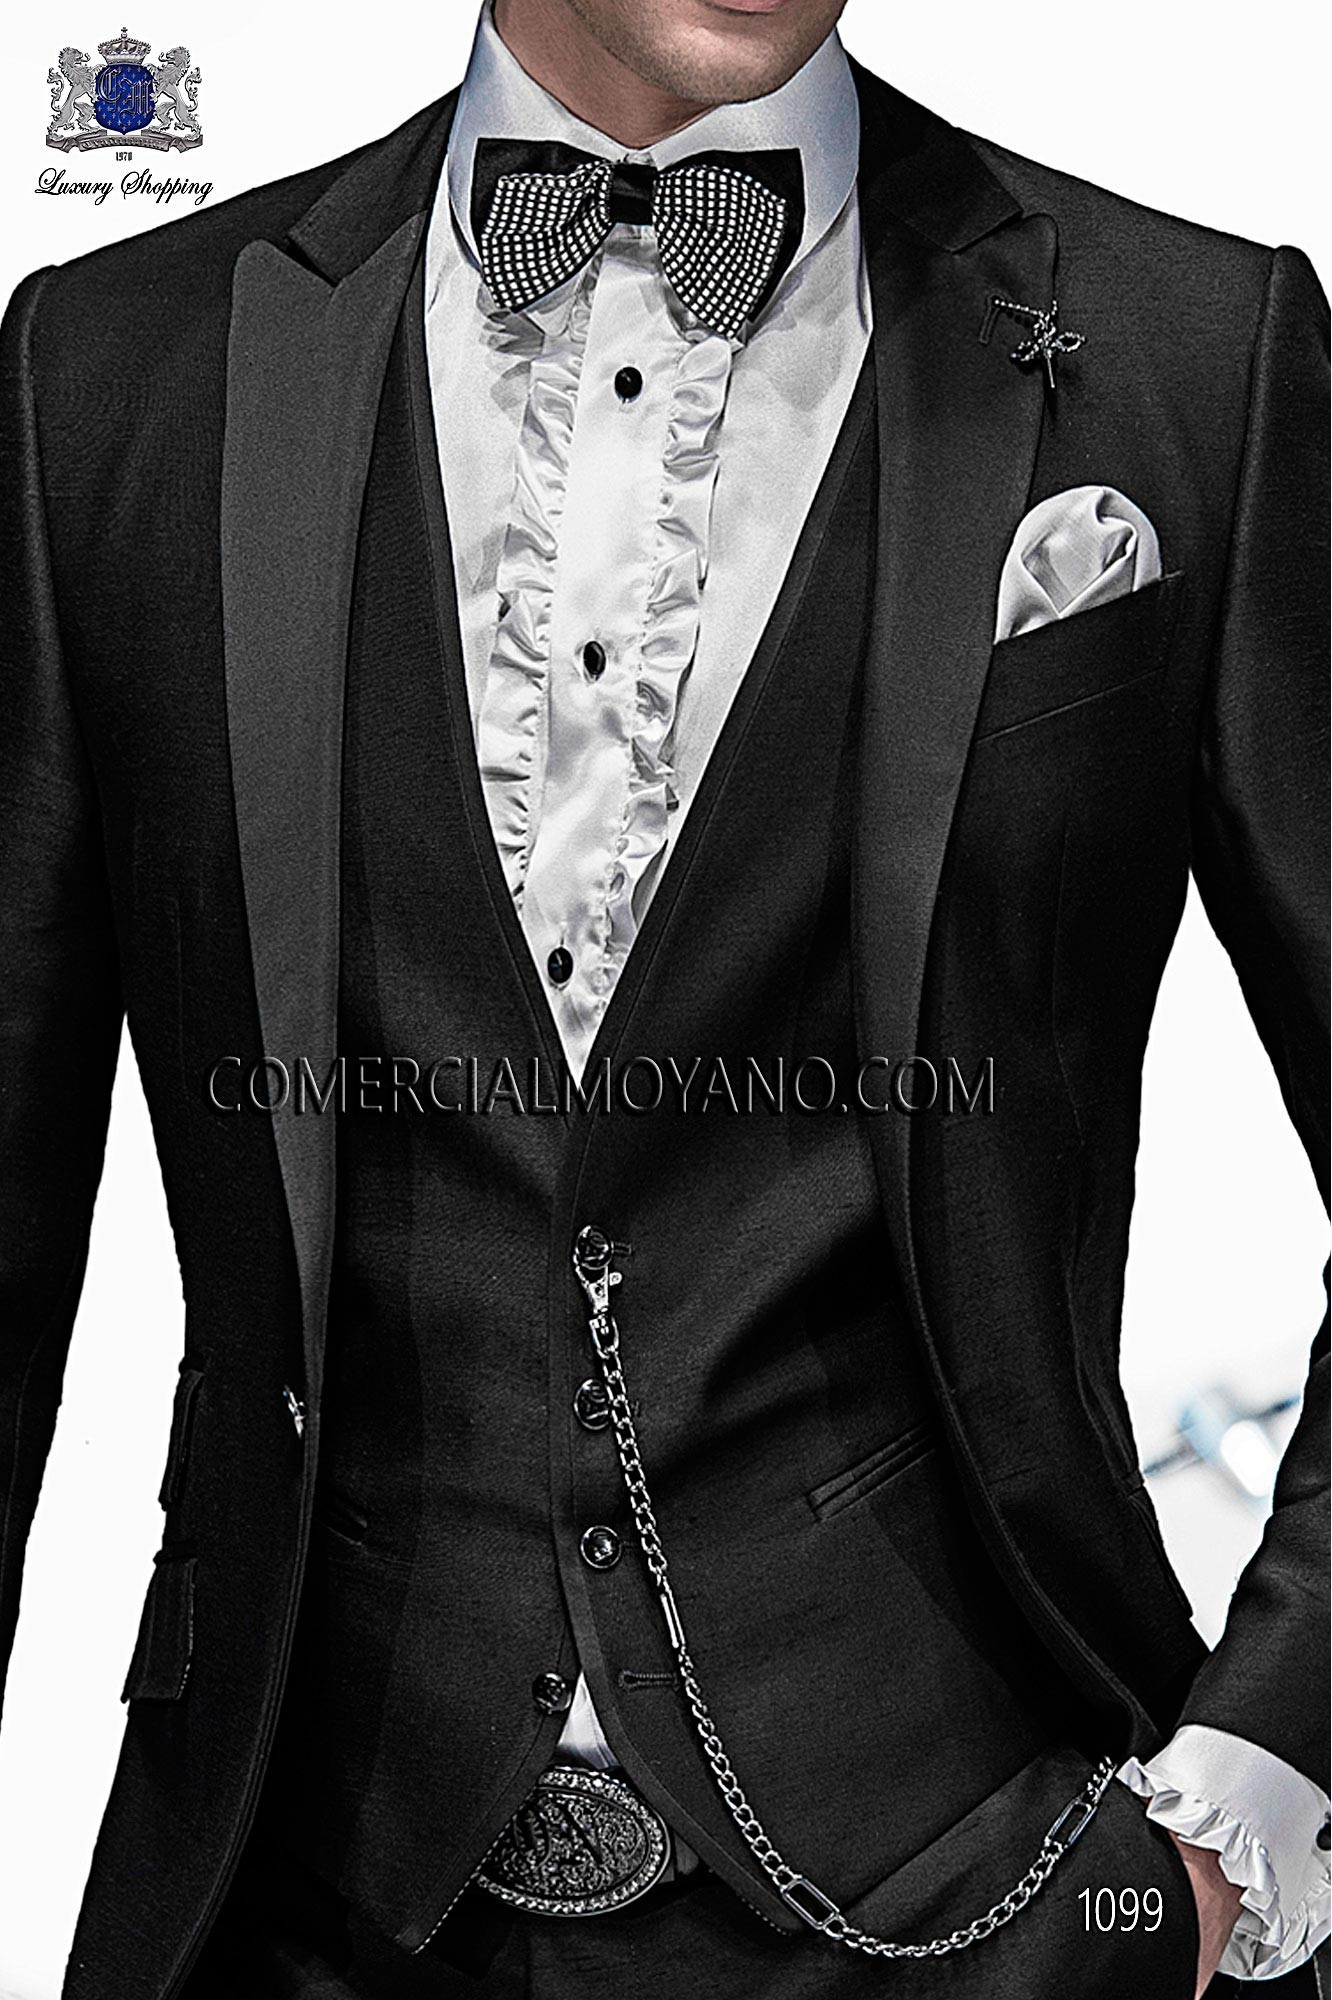 Italian emotion black men wedding suit, model: 1099 Ottavio Nuccio Gala Emotion Collection